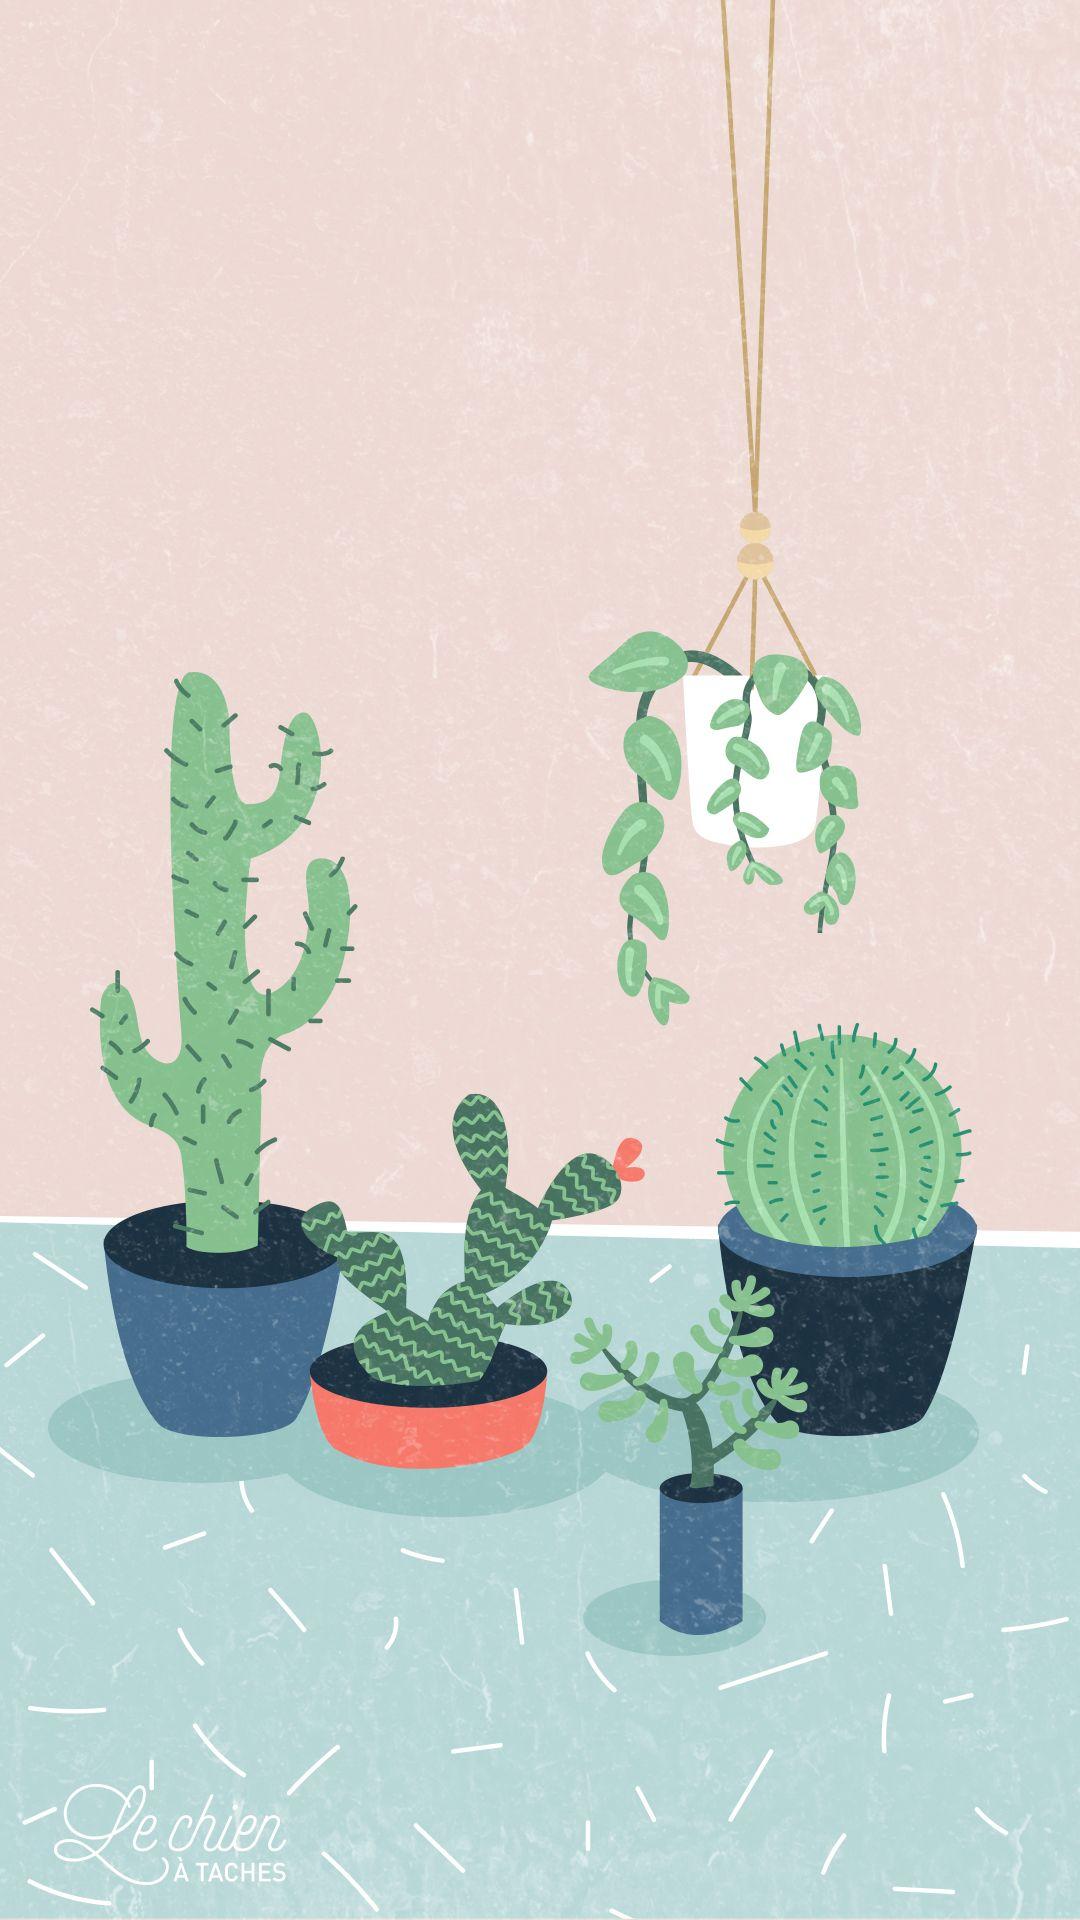 Cactus Girl Pastel iPhone Lock Wallpaper PanPins Fondos